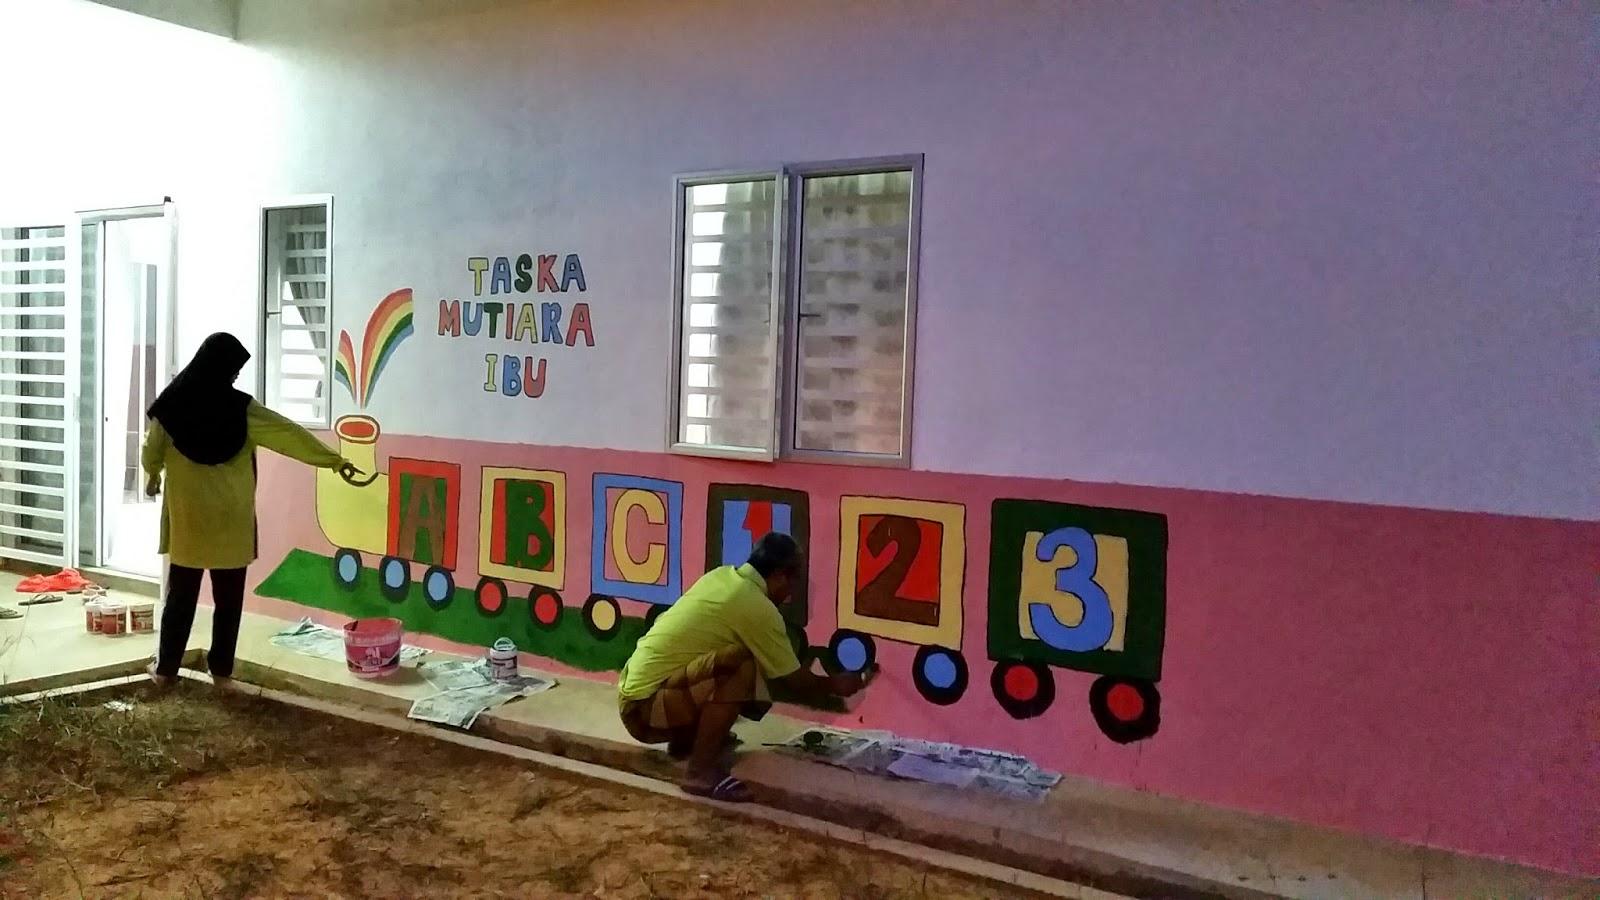 Bermula ceritaku projek melukis mural taska for Mural untuk taska